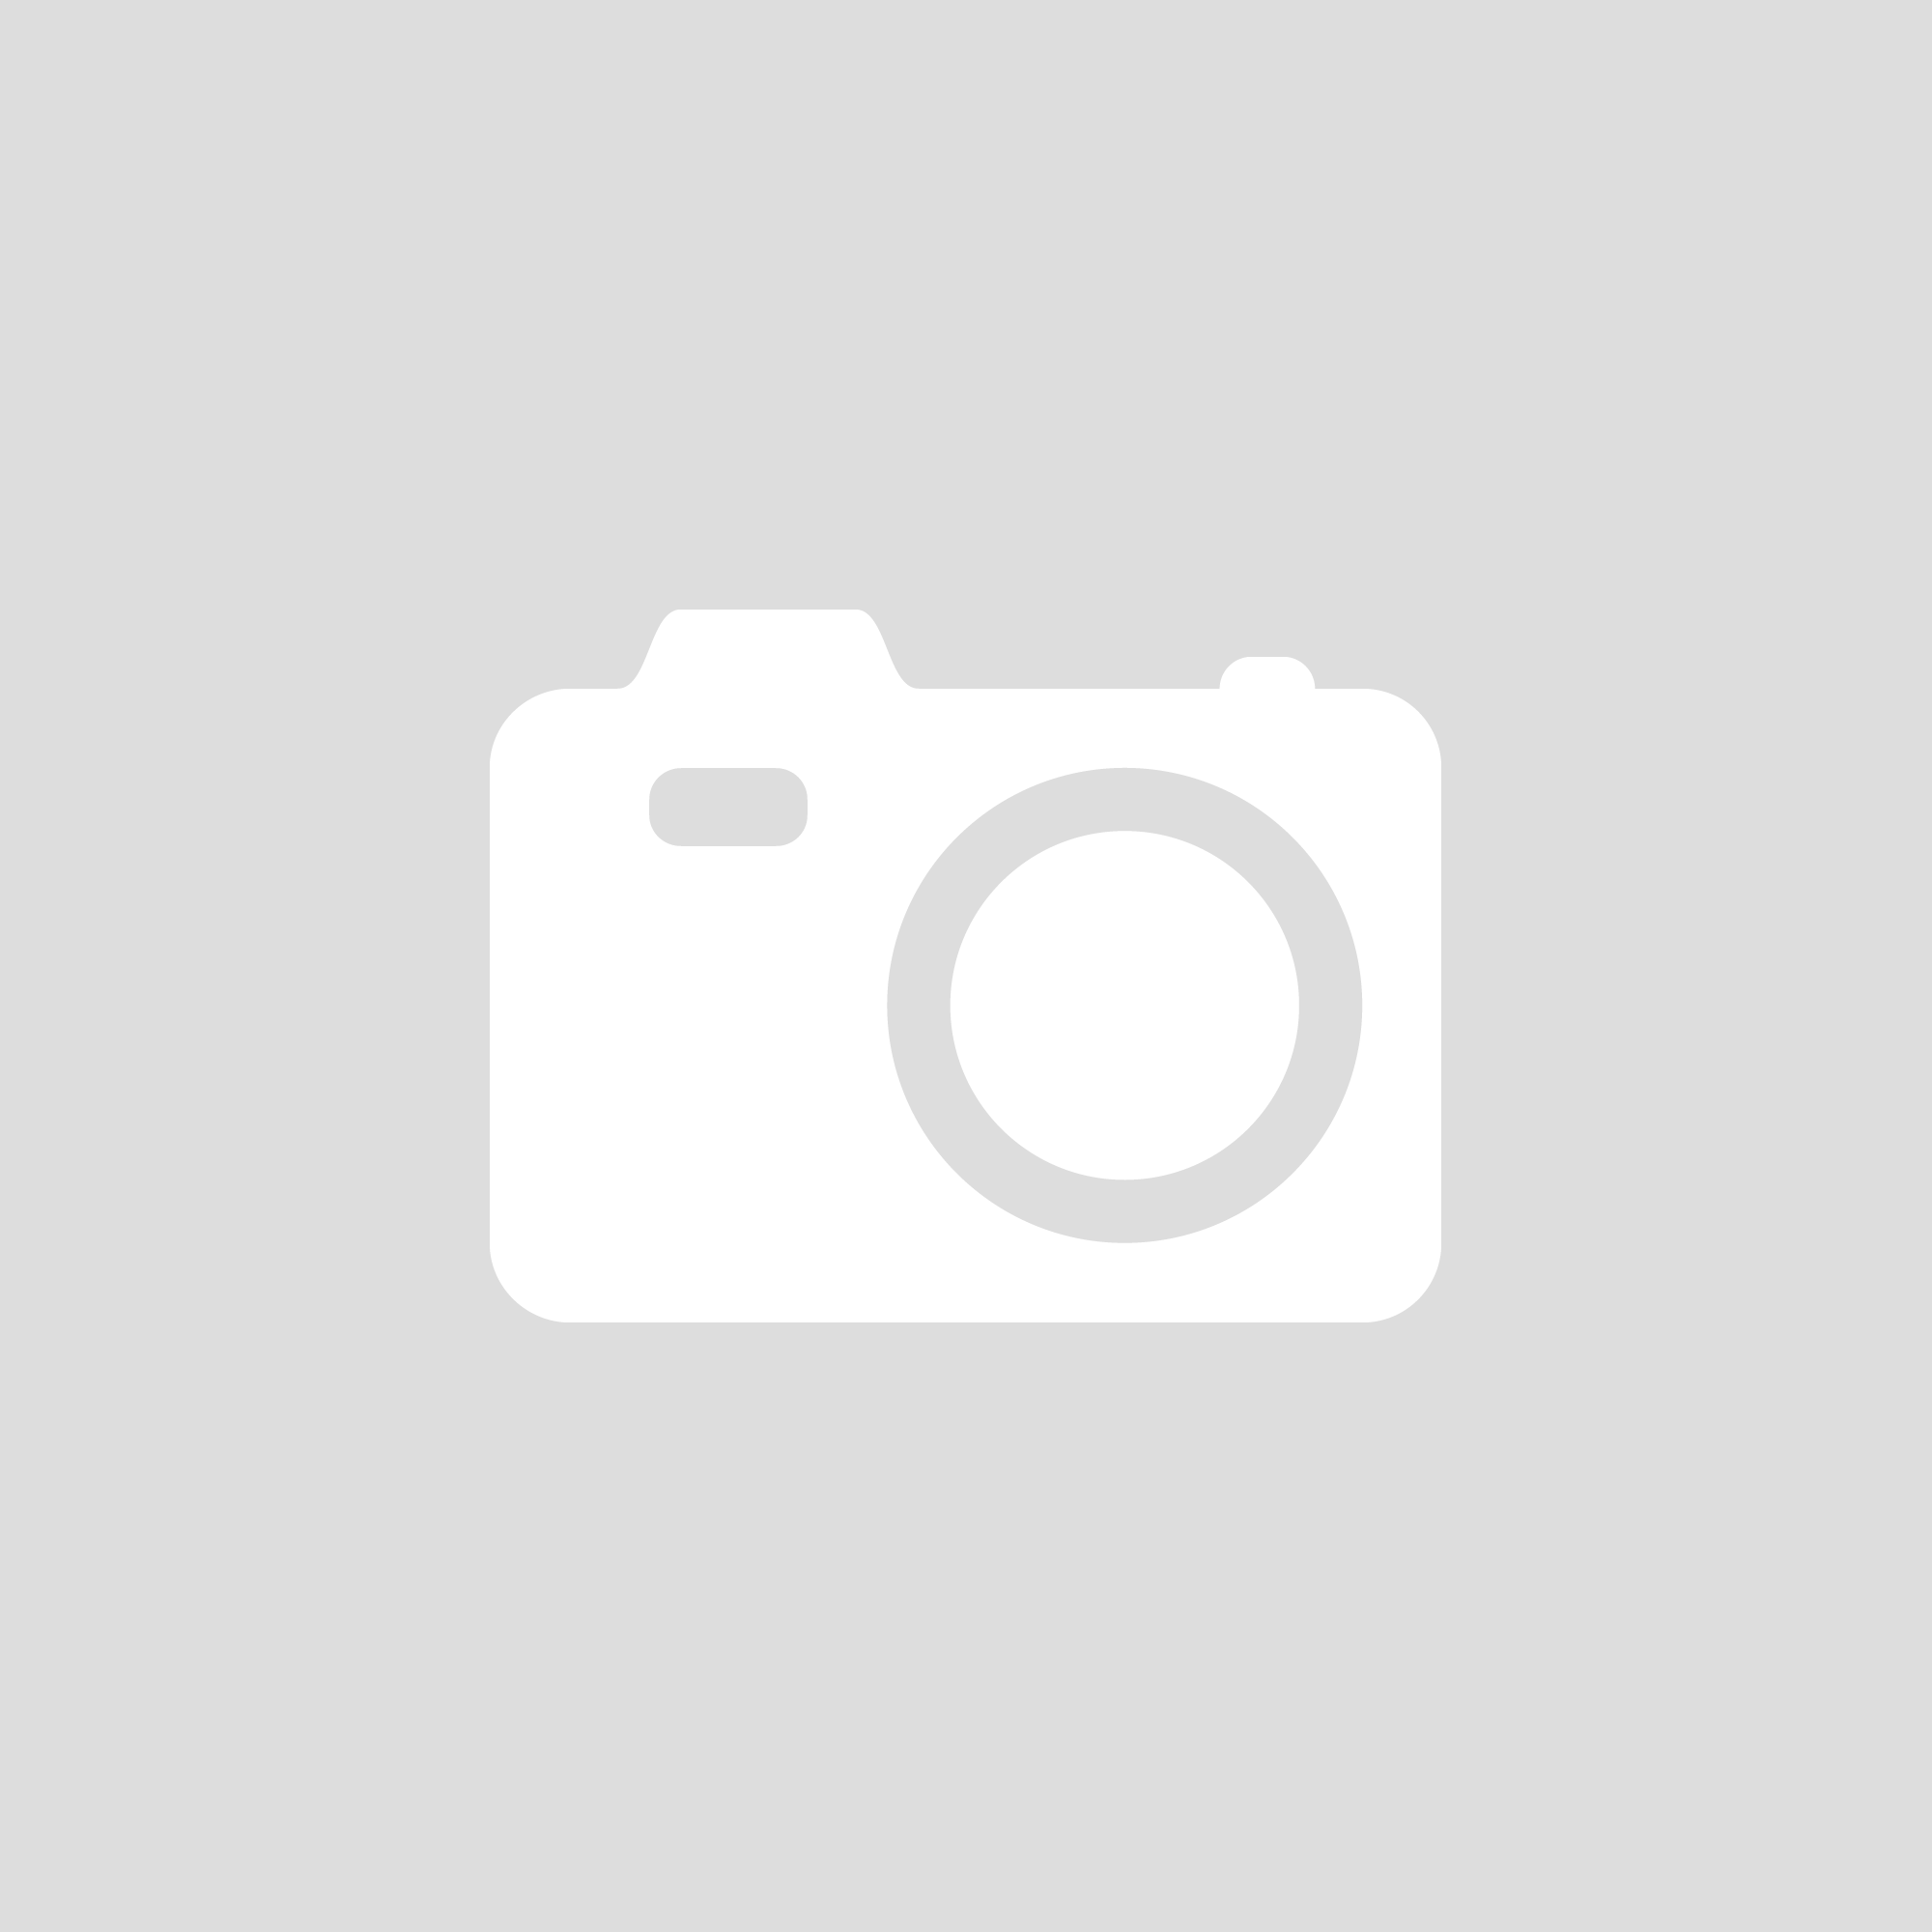 Sensation Dandelion Wallpaper Lilac / Heather / Grape by GranDeco 227279